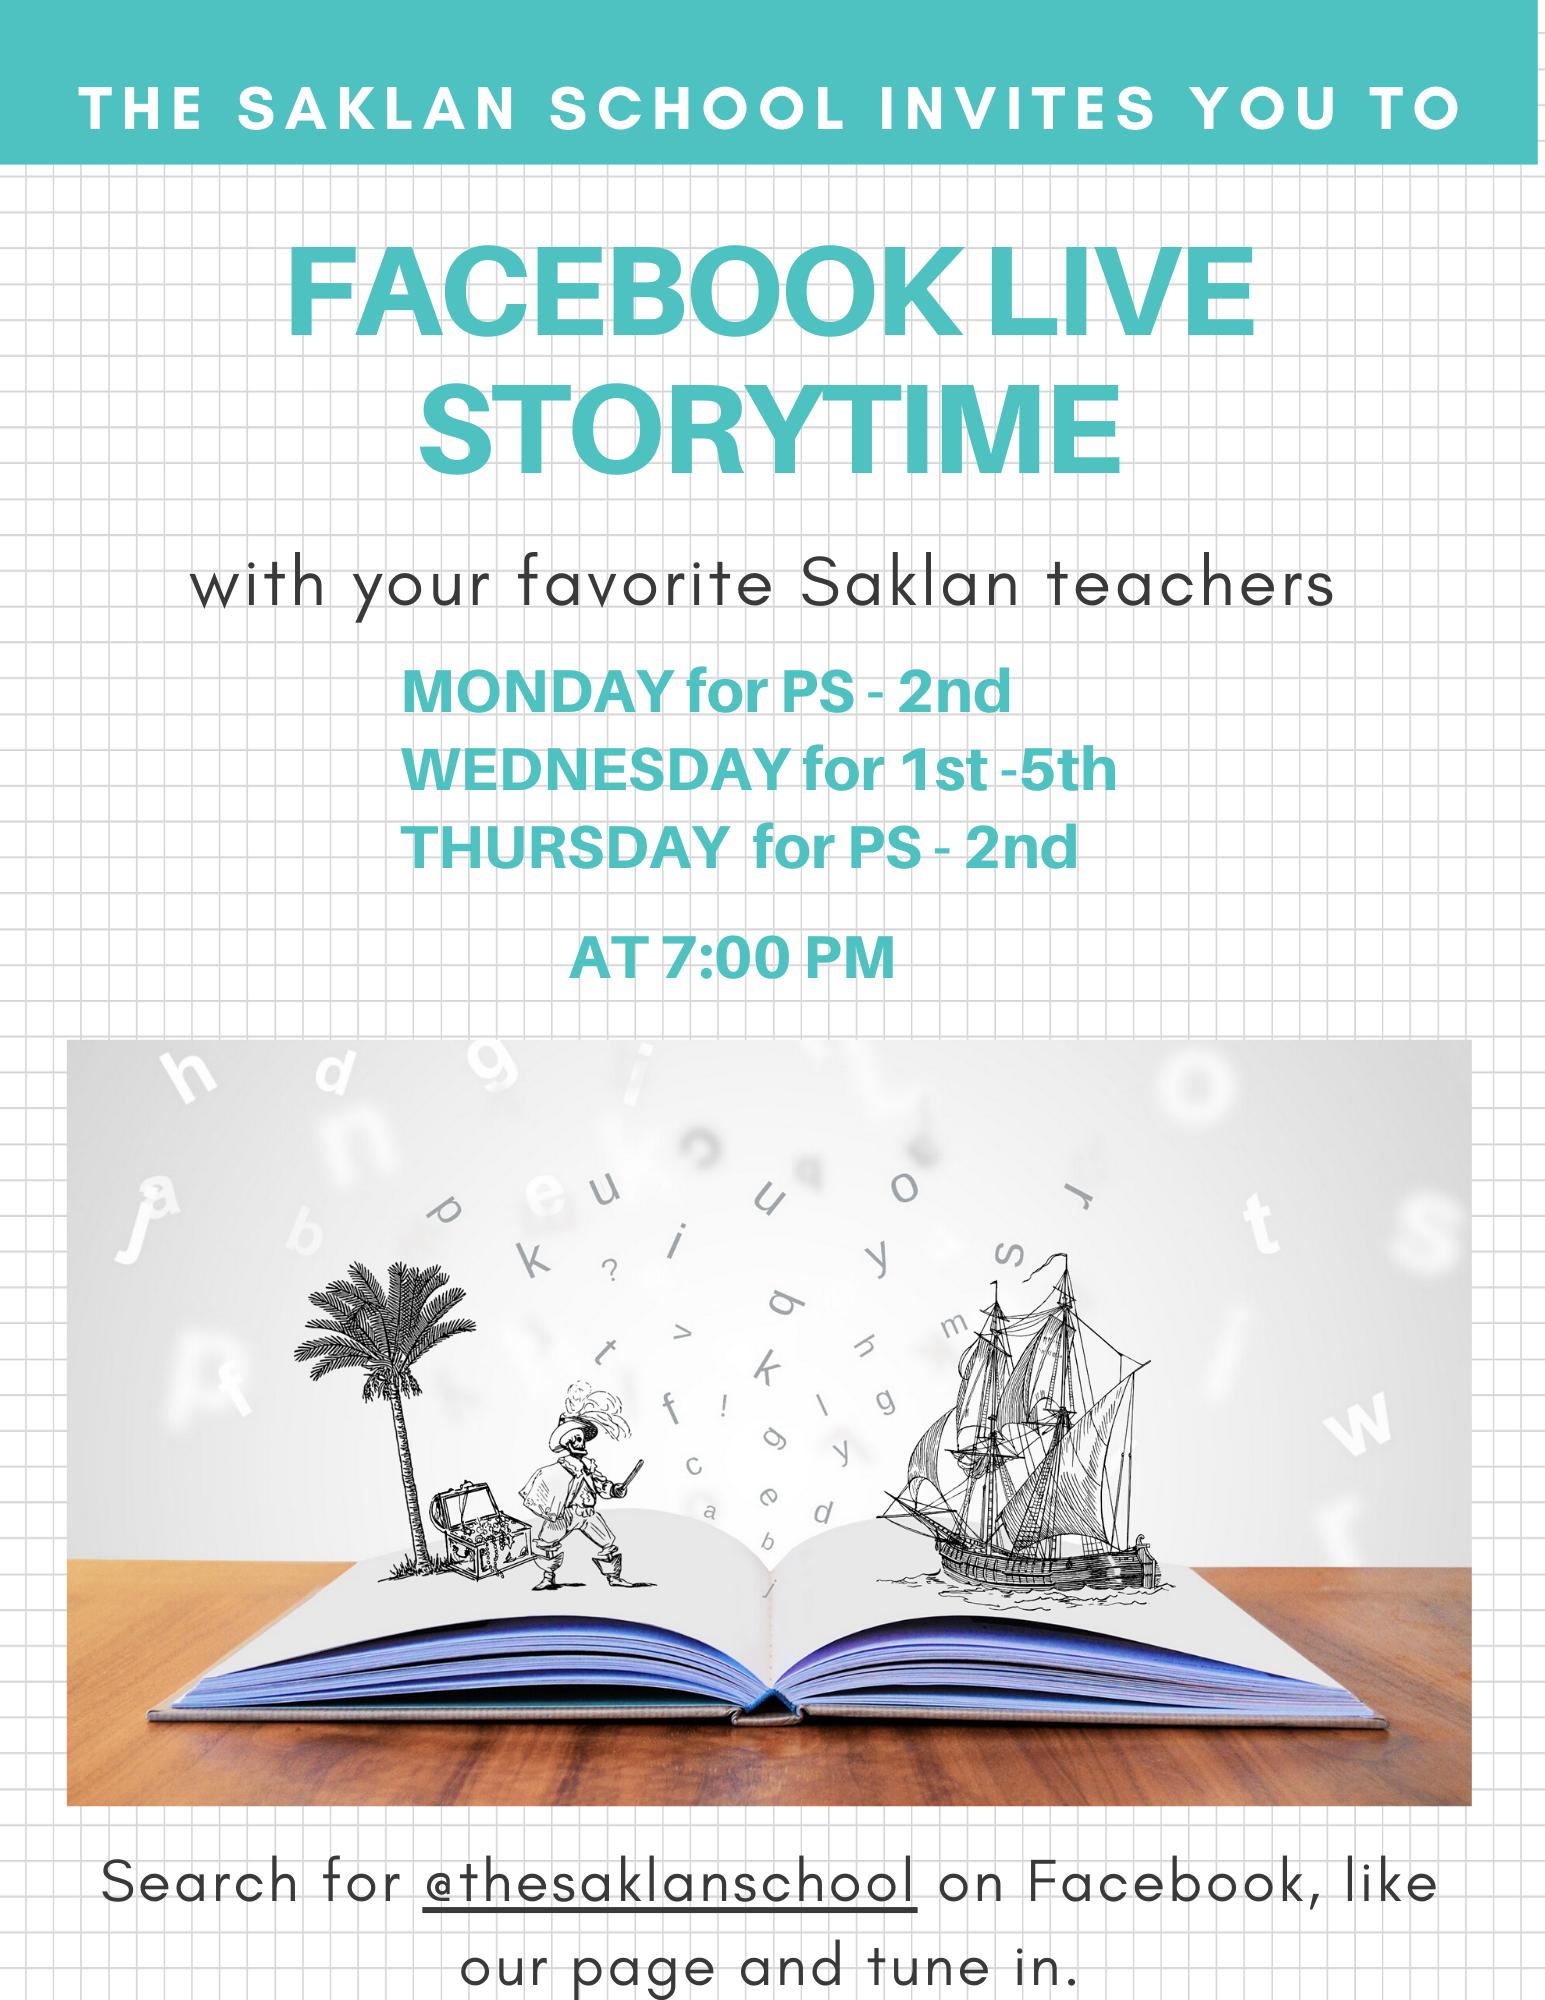 THE saklan school invites you to